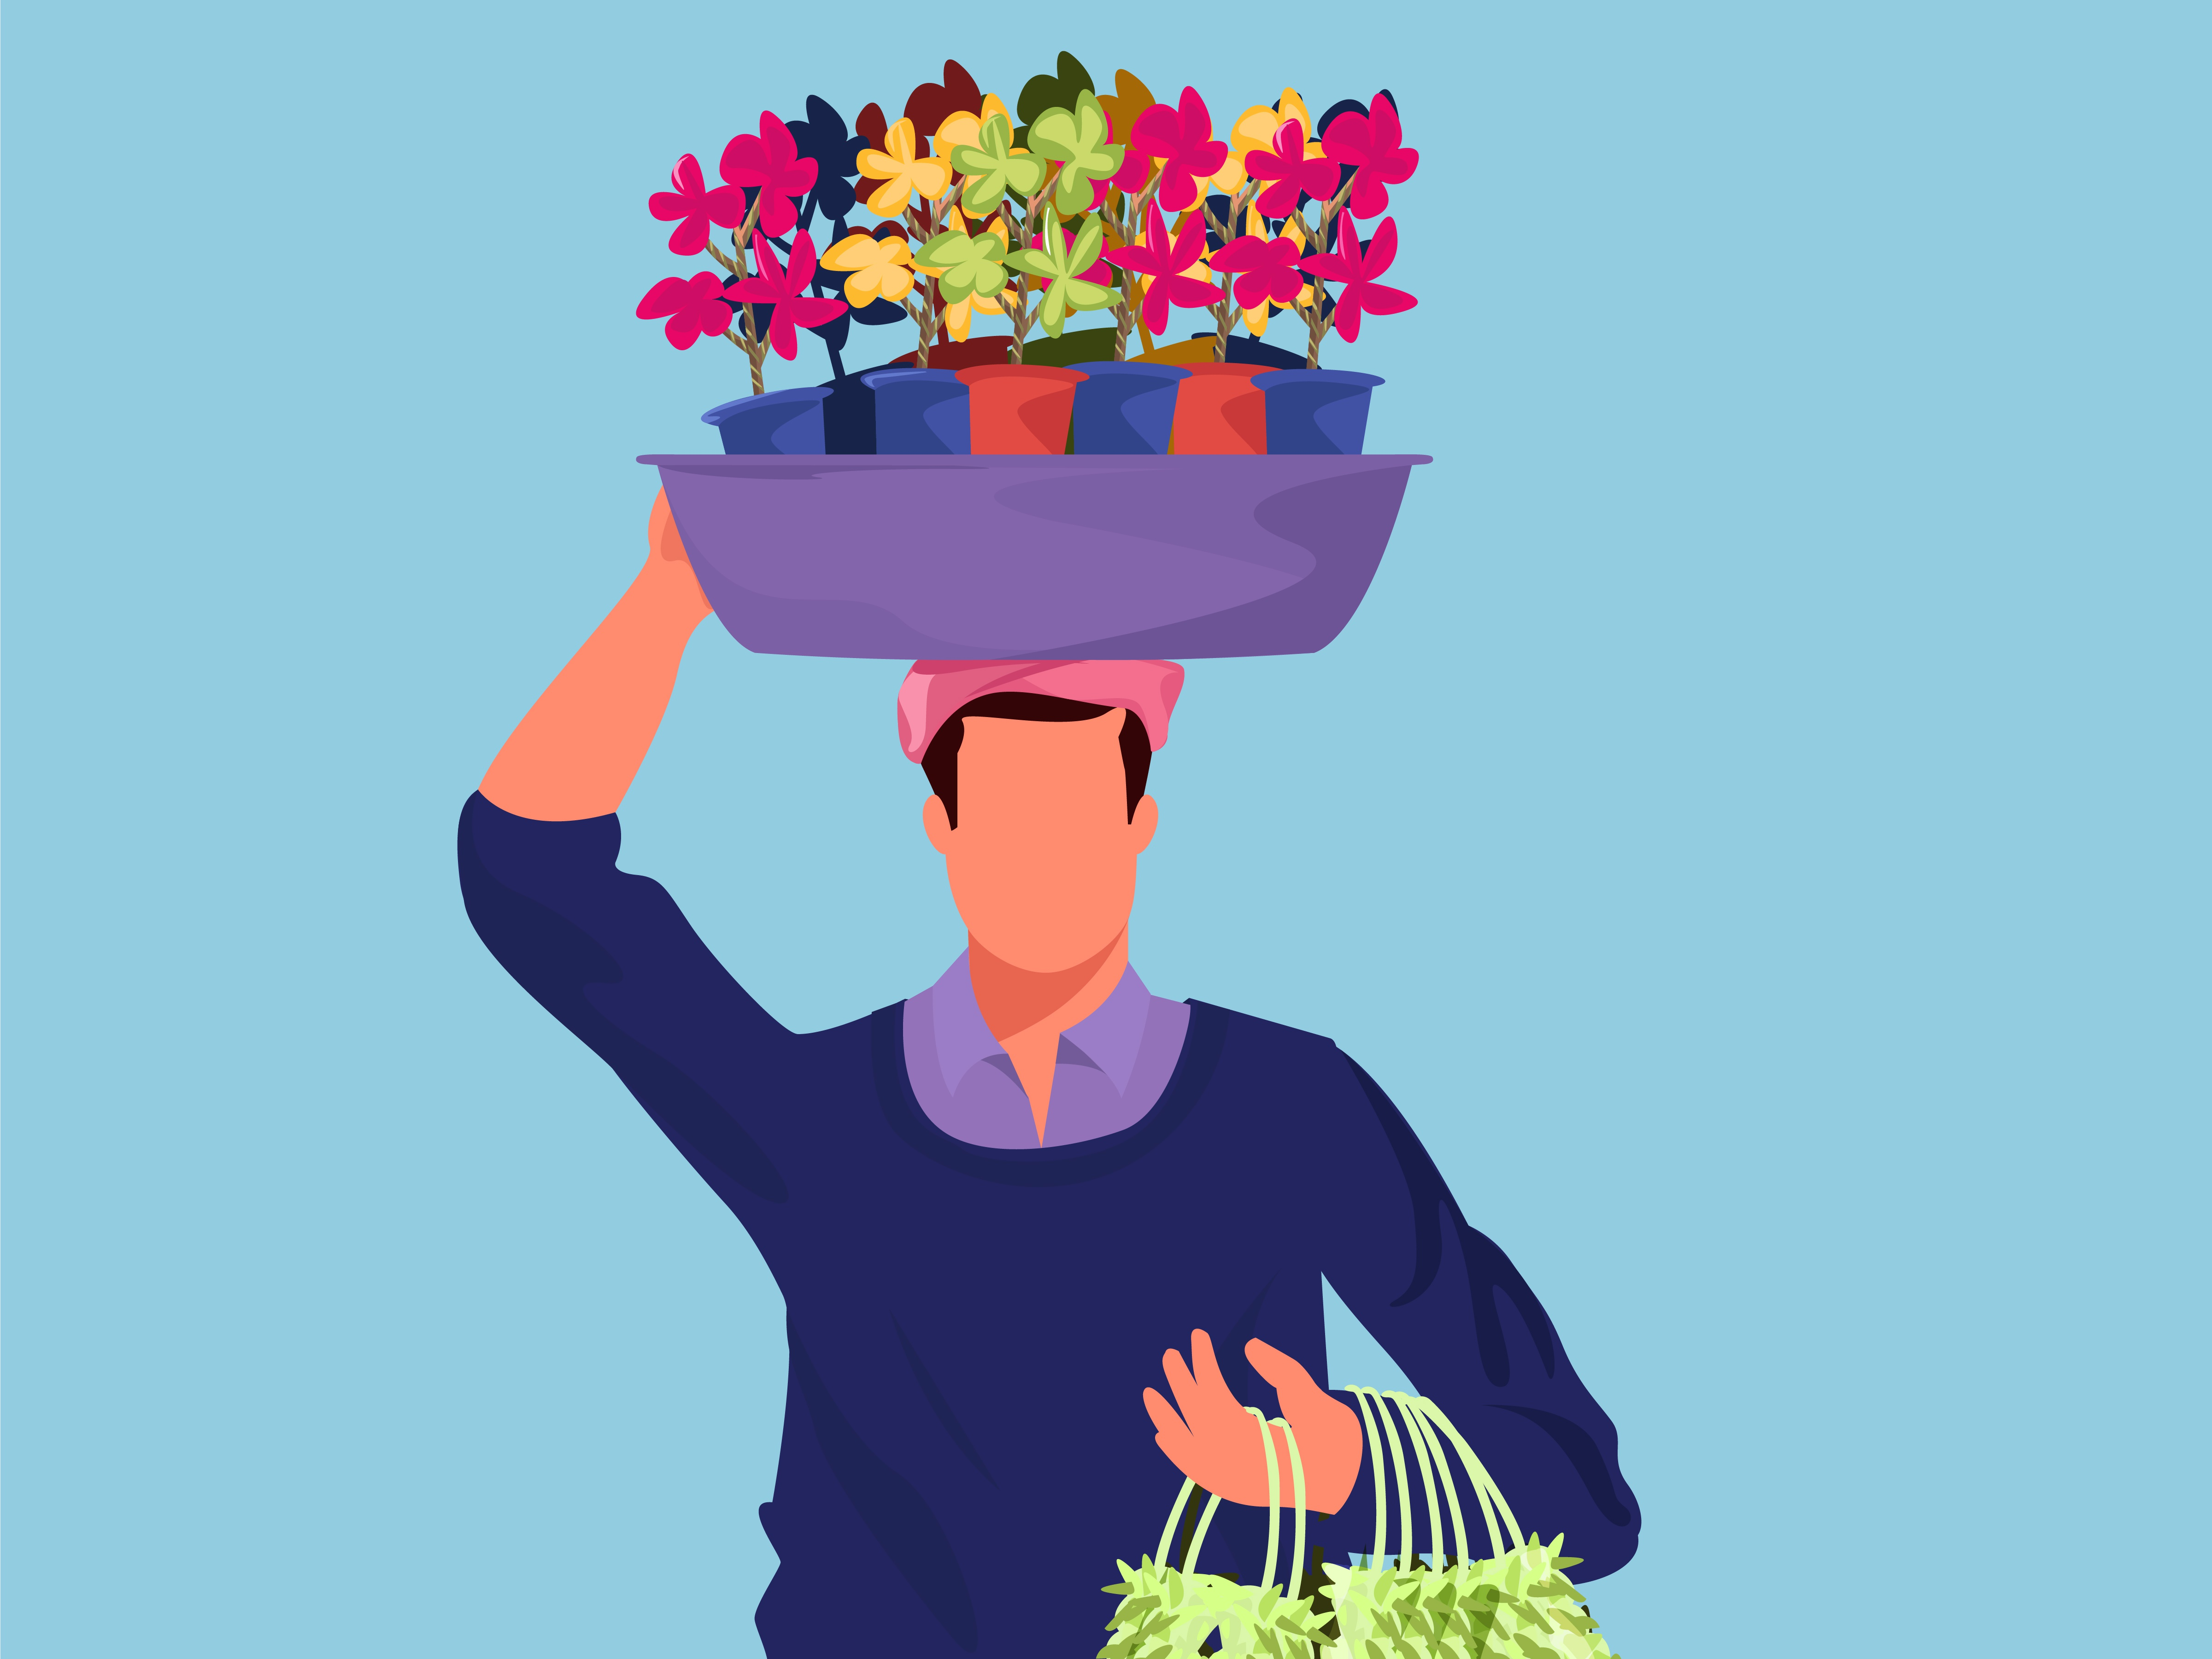 Plastic flower sale man 400x300